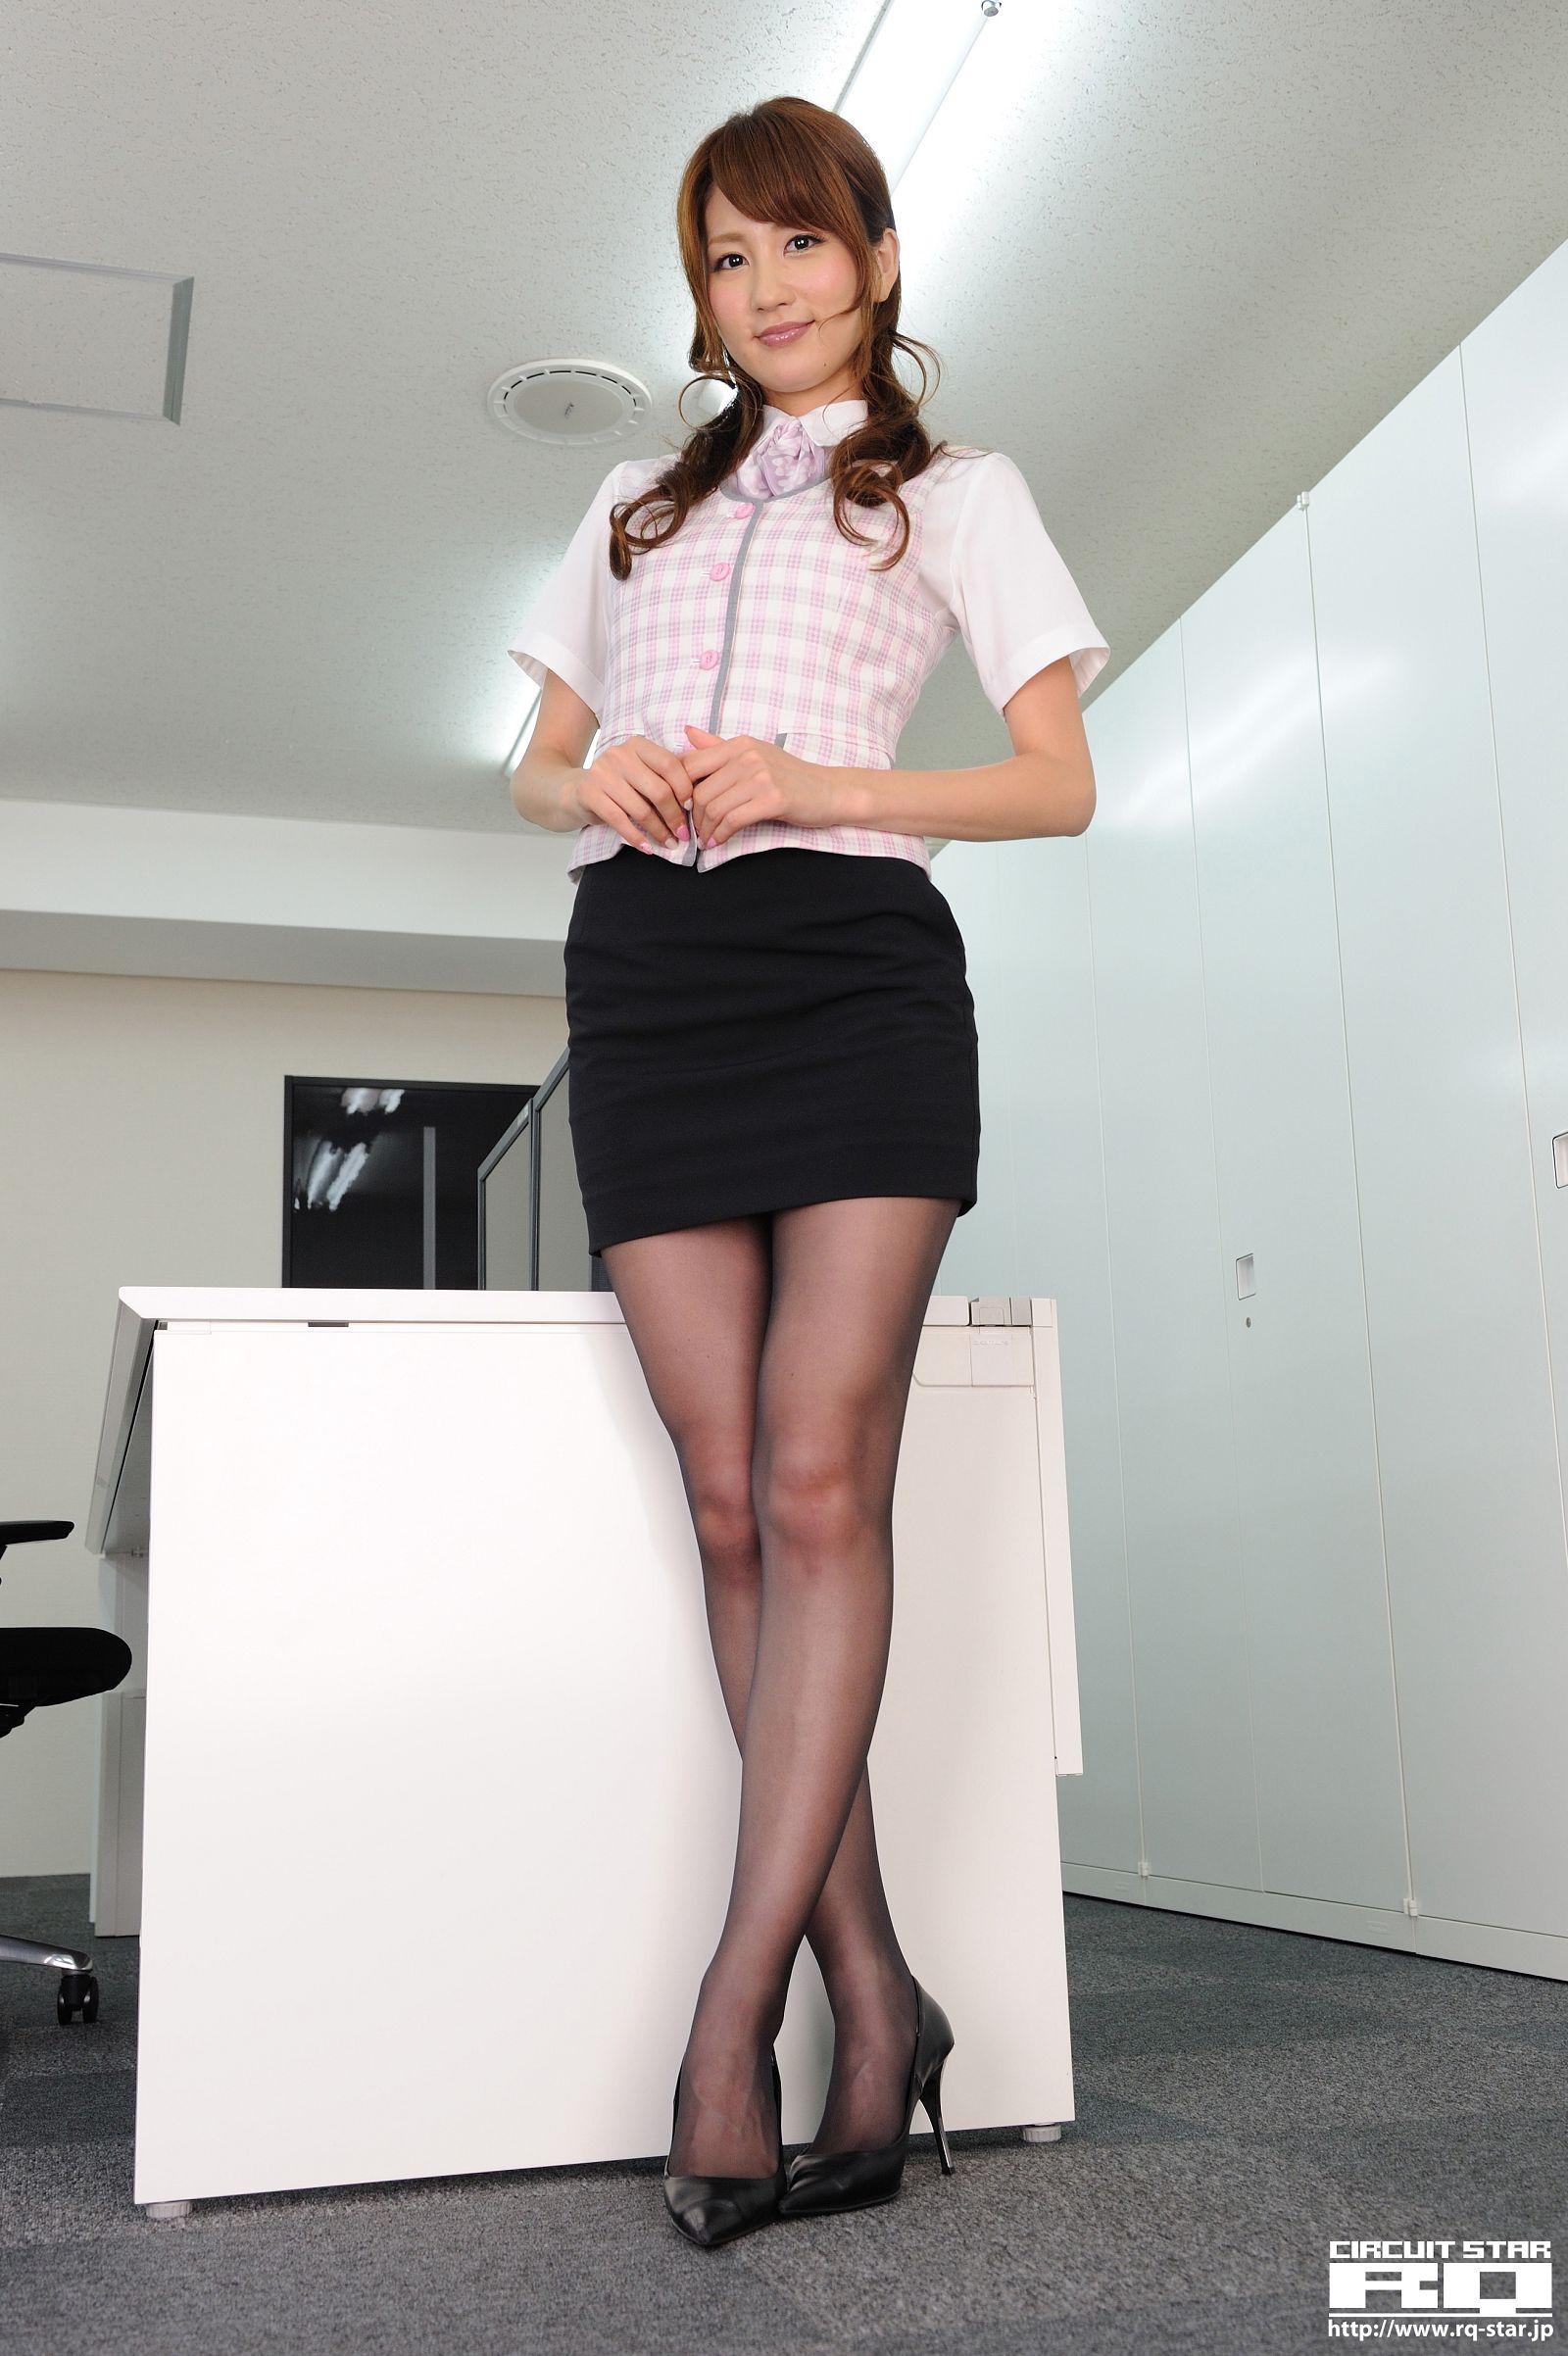 [RQ STAR美女] NO.00518 Maasa Maeda 前田真麻 Office Lady[100P] RQ STAR 第1张